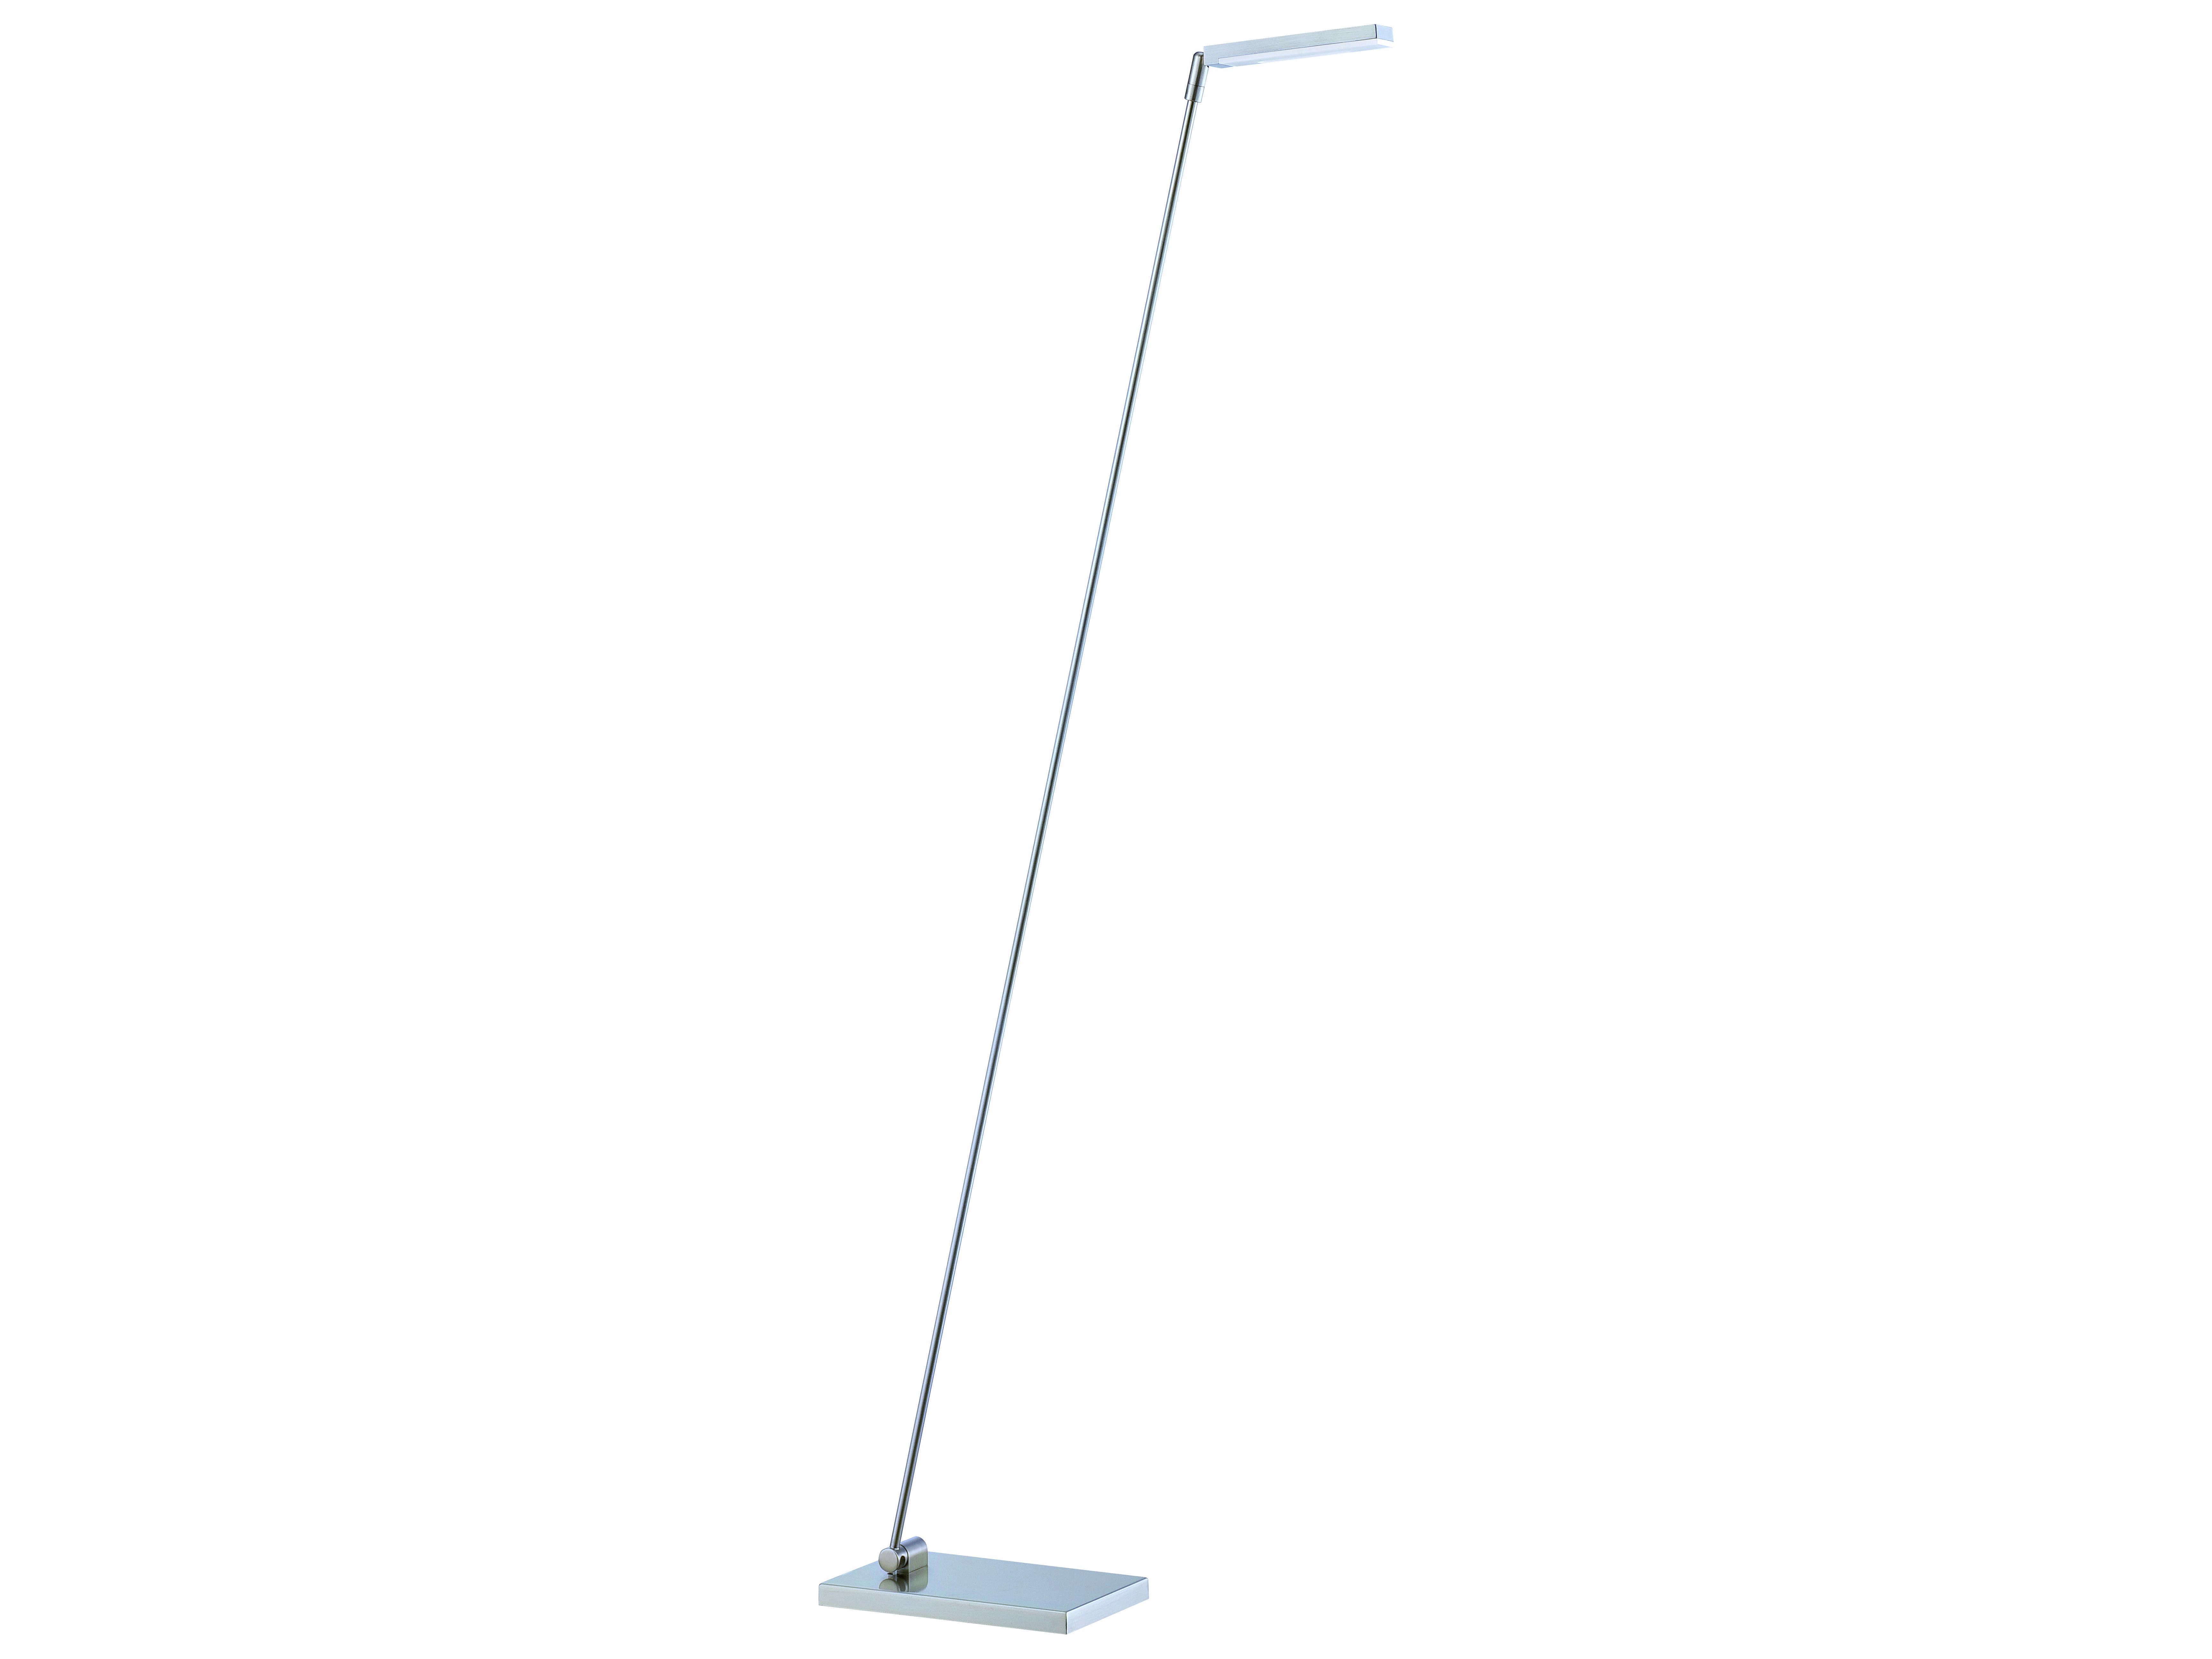 Kendal Lighting Lexx Satin Nickel Led Floor Lamp pertaining to sizing 6917 X 5189